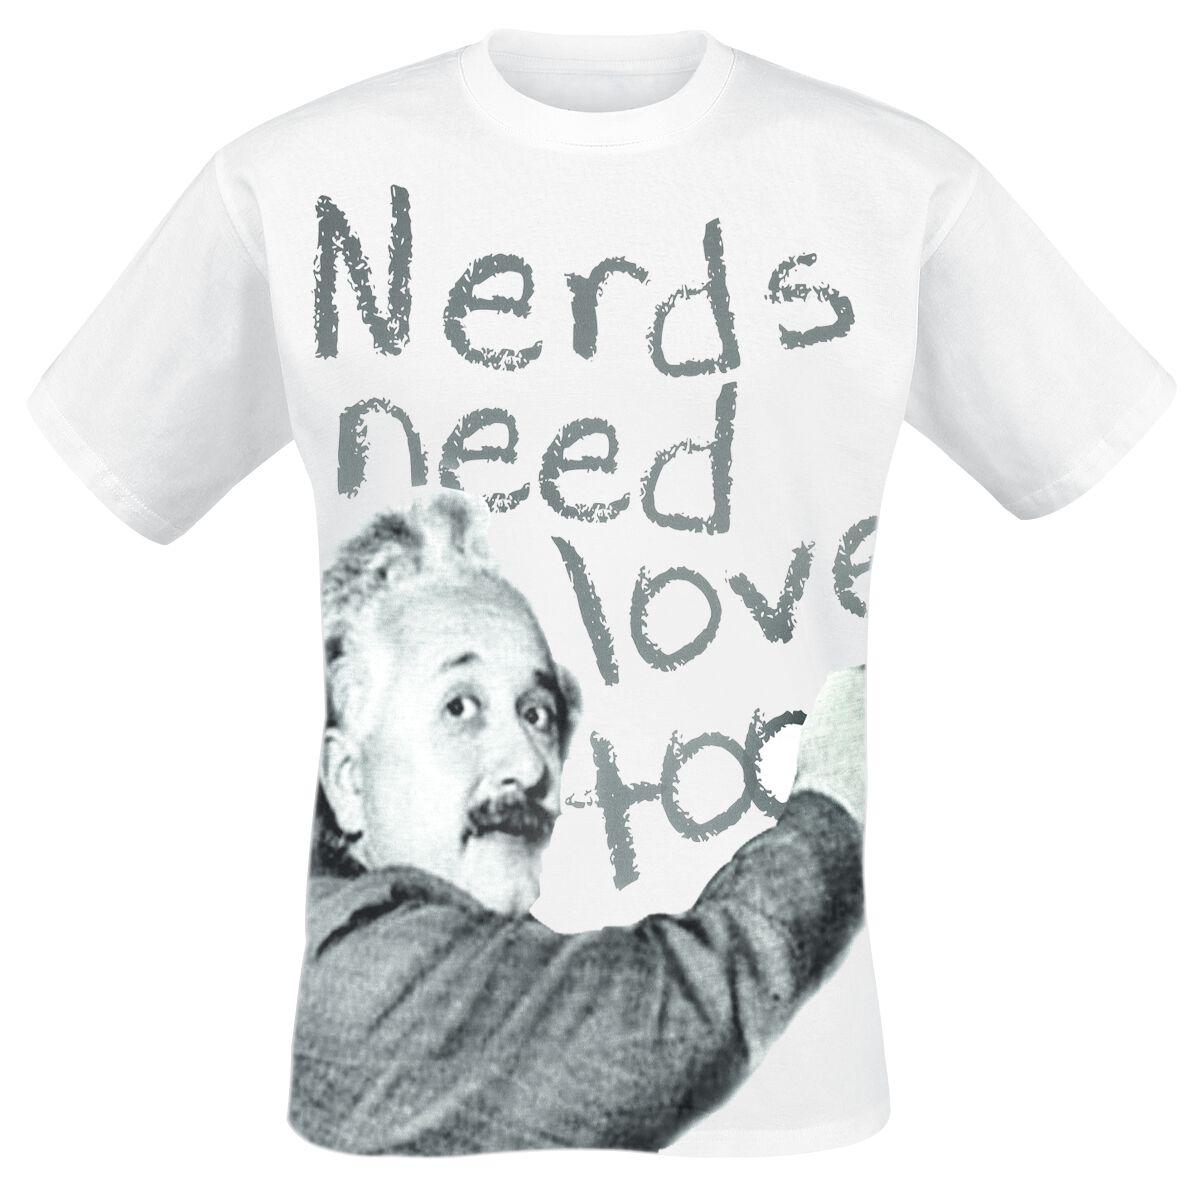 Merch dla Fanów - Koszulki - T-Shirt Albert Einstein Nerds Need Love Too T-Shirt biały - 357183